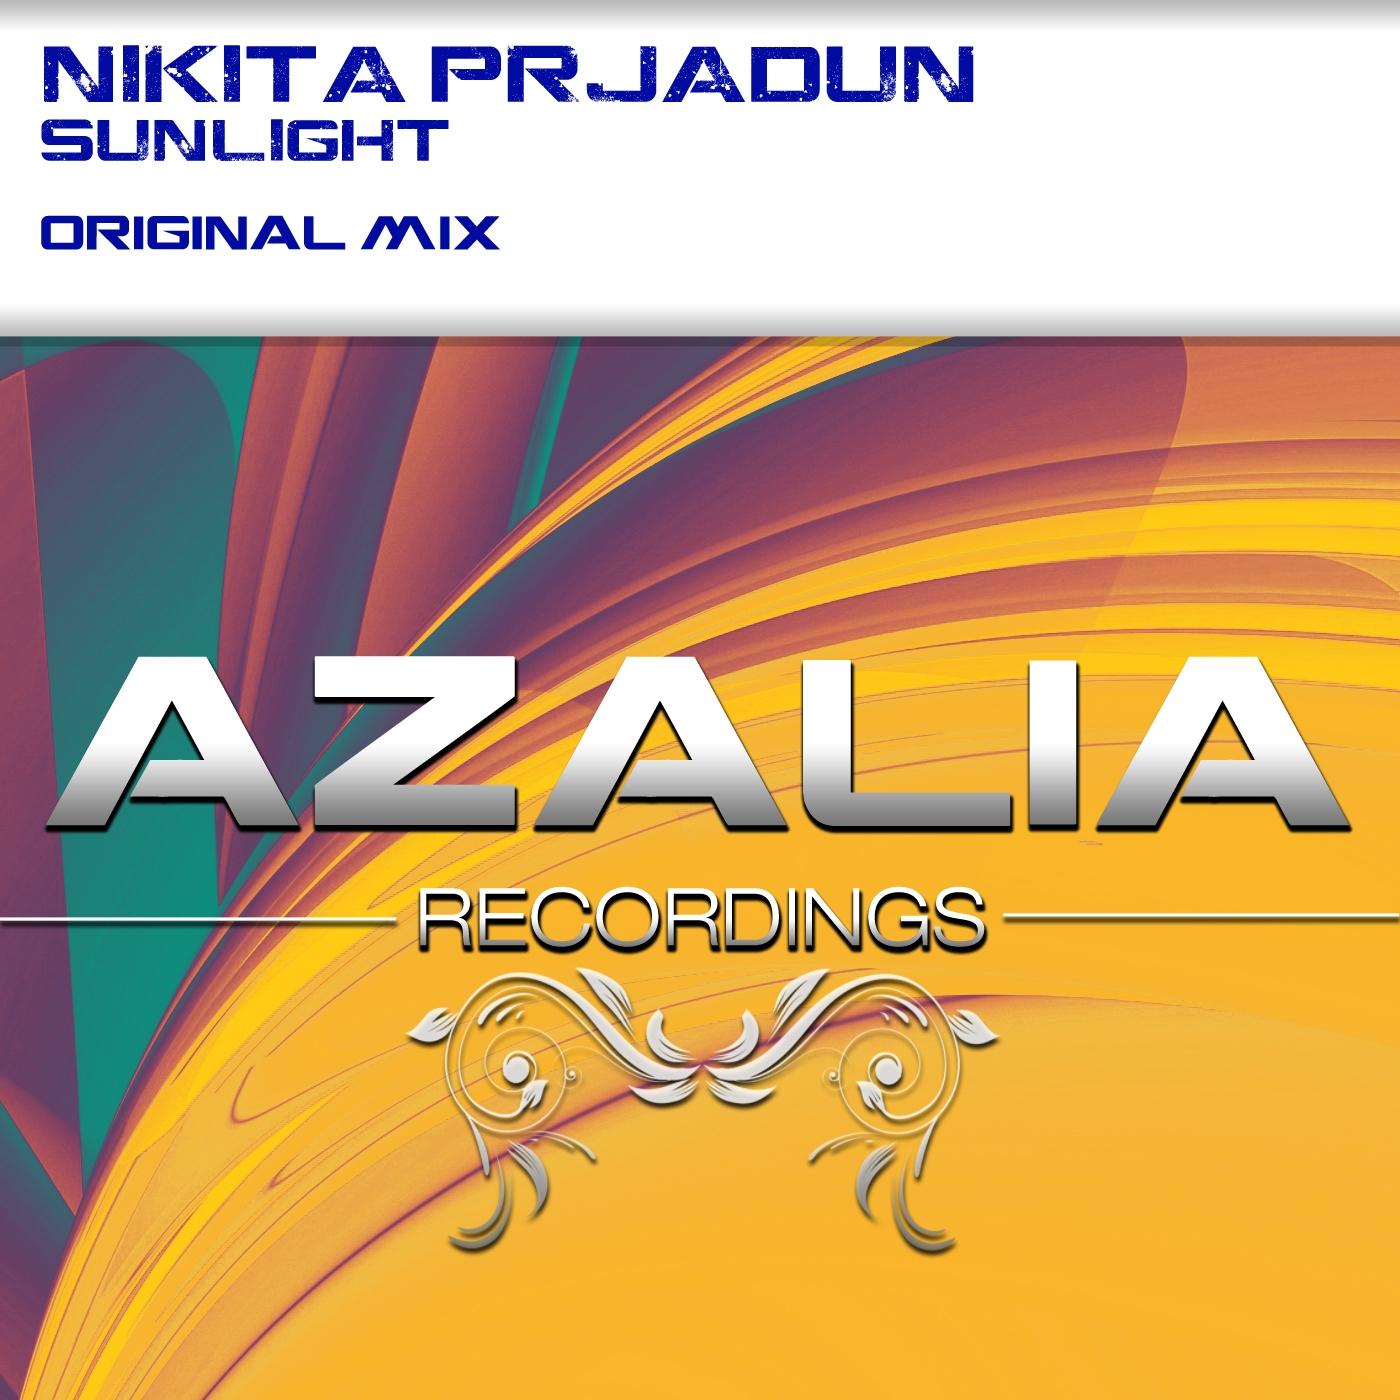 Nikita Prjadun - Sunlight (Original Mix)